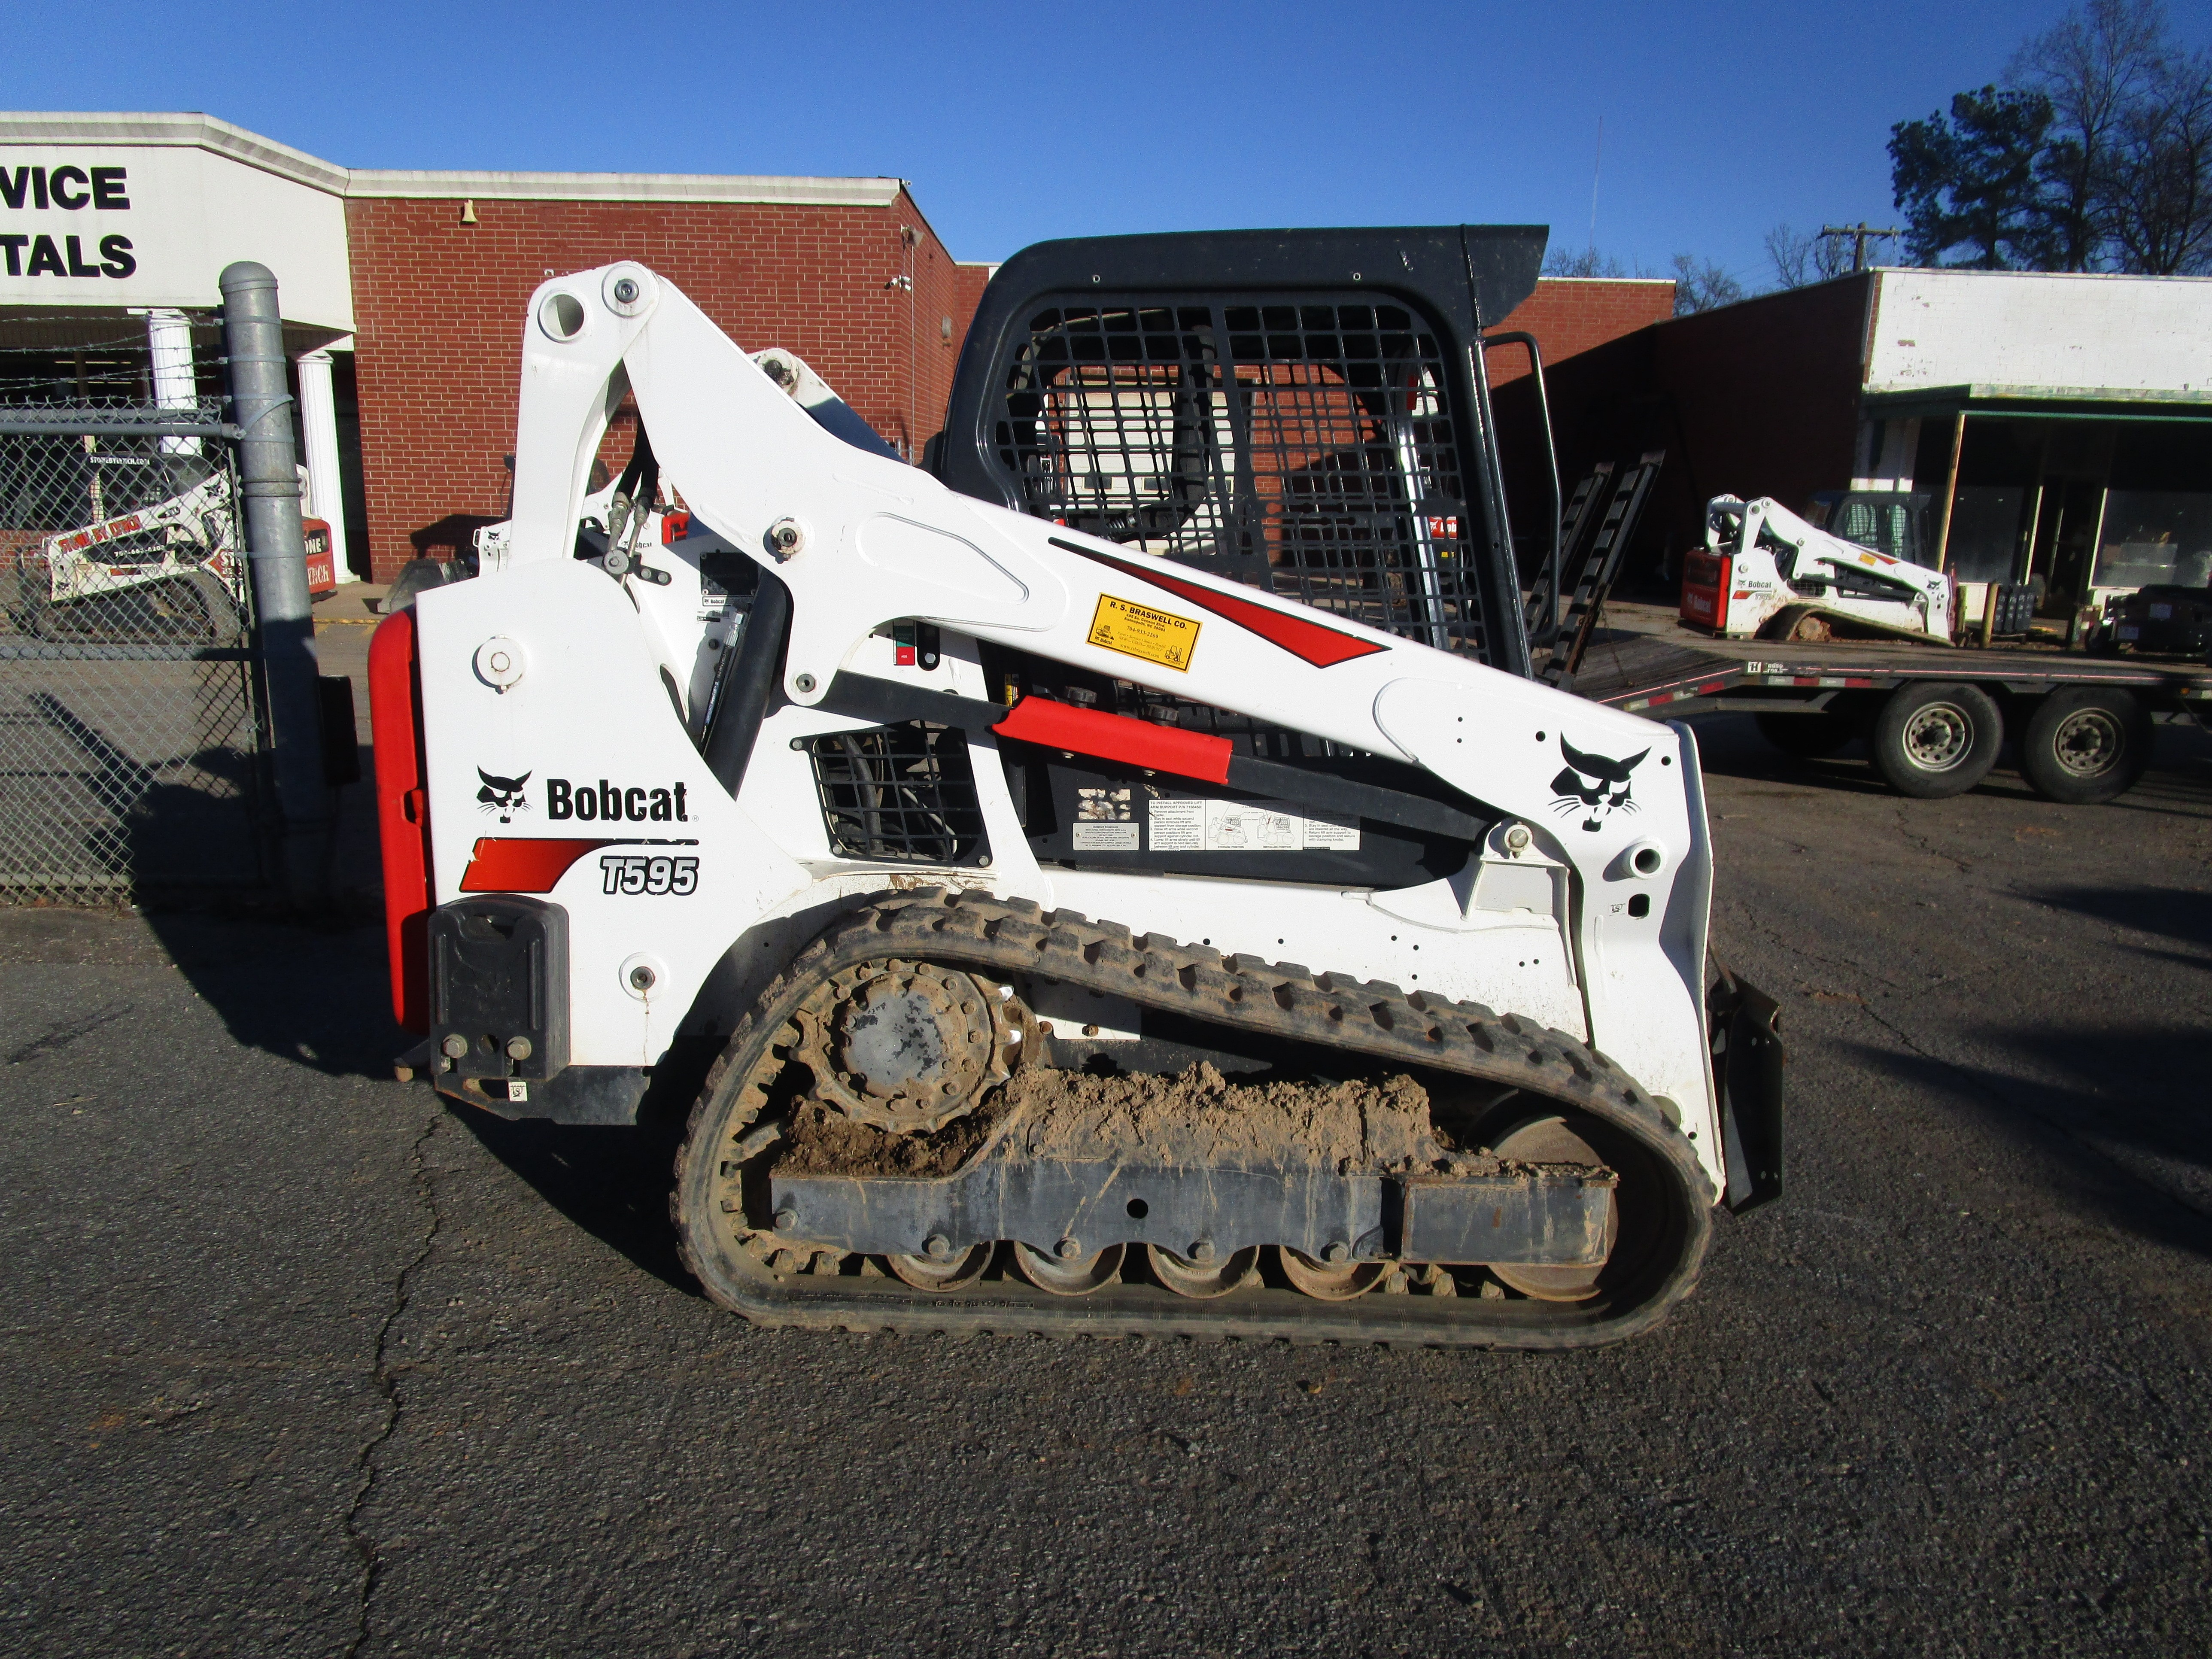 Bobcat Dealer in North Carolina | Loaders, Excavators, UTVs